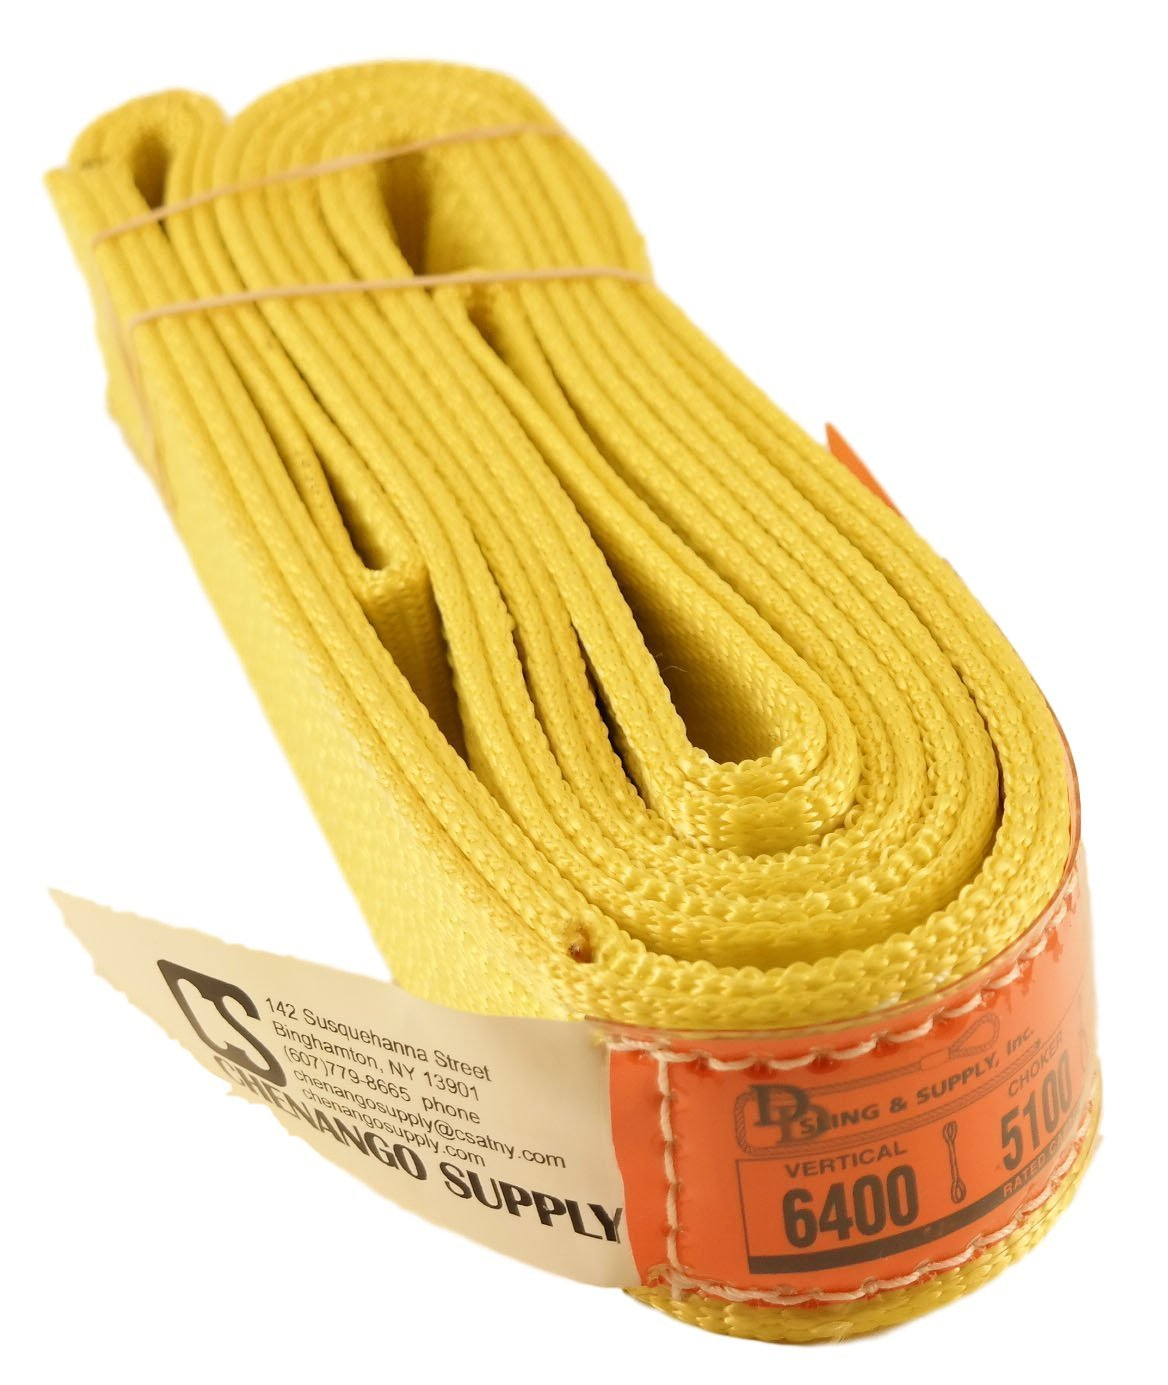 DD Sling. Multiple Sizes in Listing! (Made in USA) 2'' x 8', 2 Ply, Nylon Lifting Slings, Eye & Eye, Heavy Duty (900 webbing), 6,400 lbs Vertical, 5,100 Choker, 12,800 Basket Load Capacity (USA Made Nylon Webbing) (2''x8')